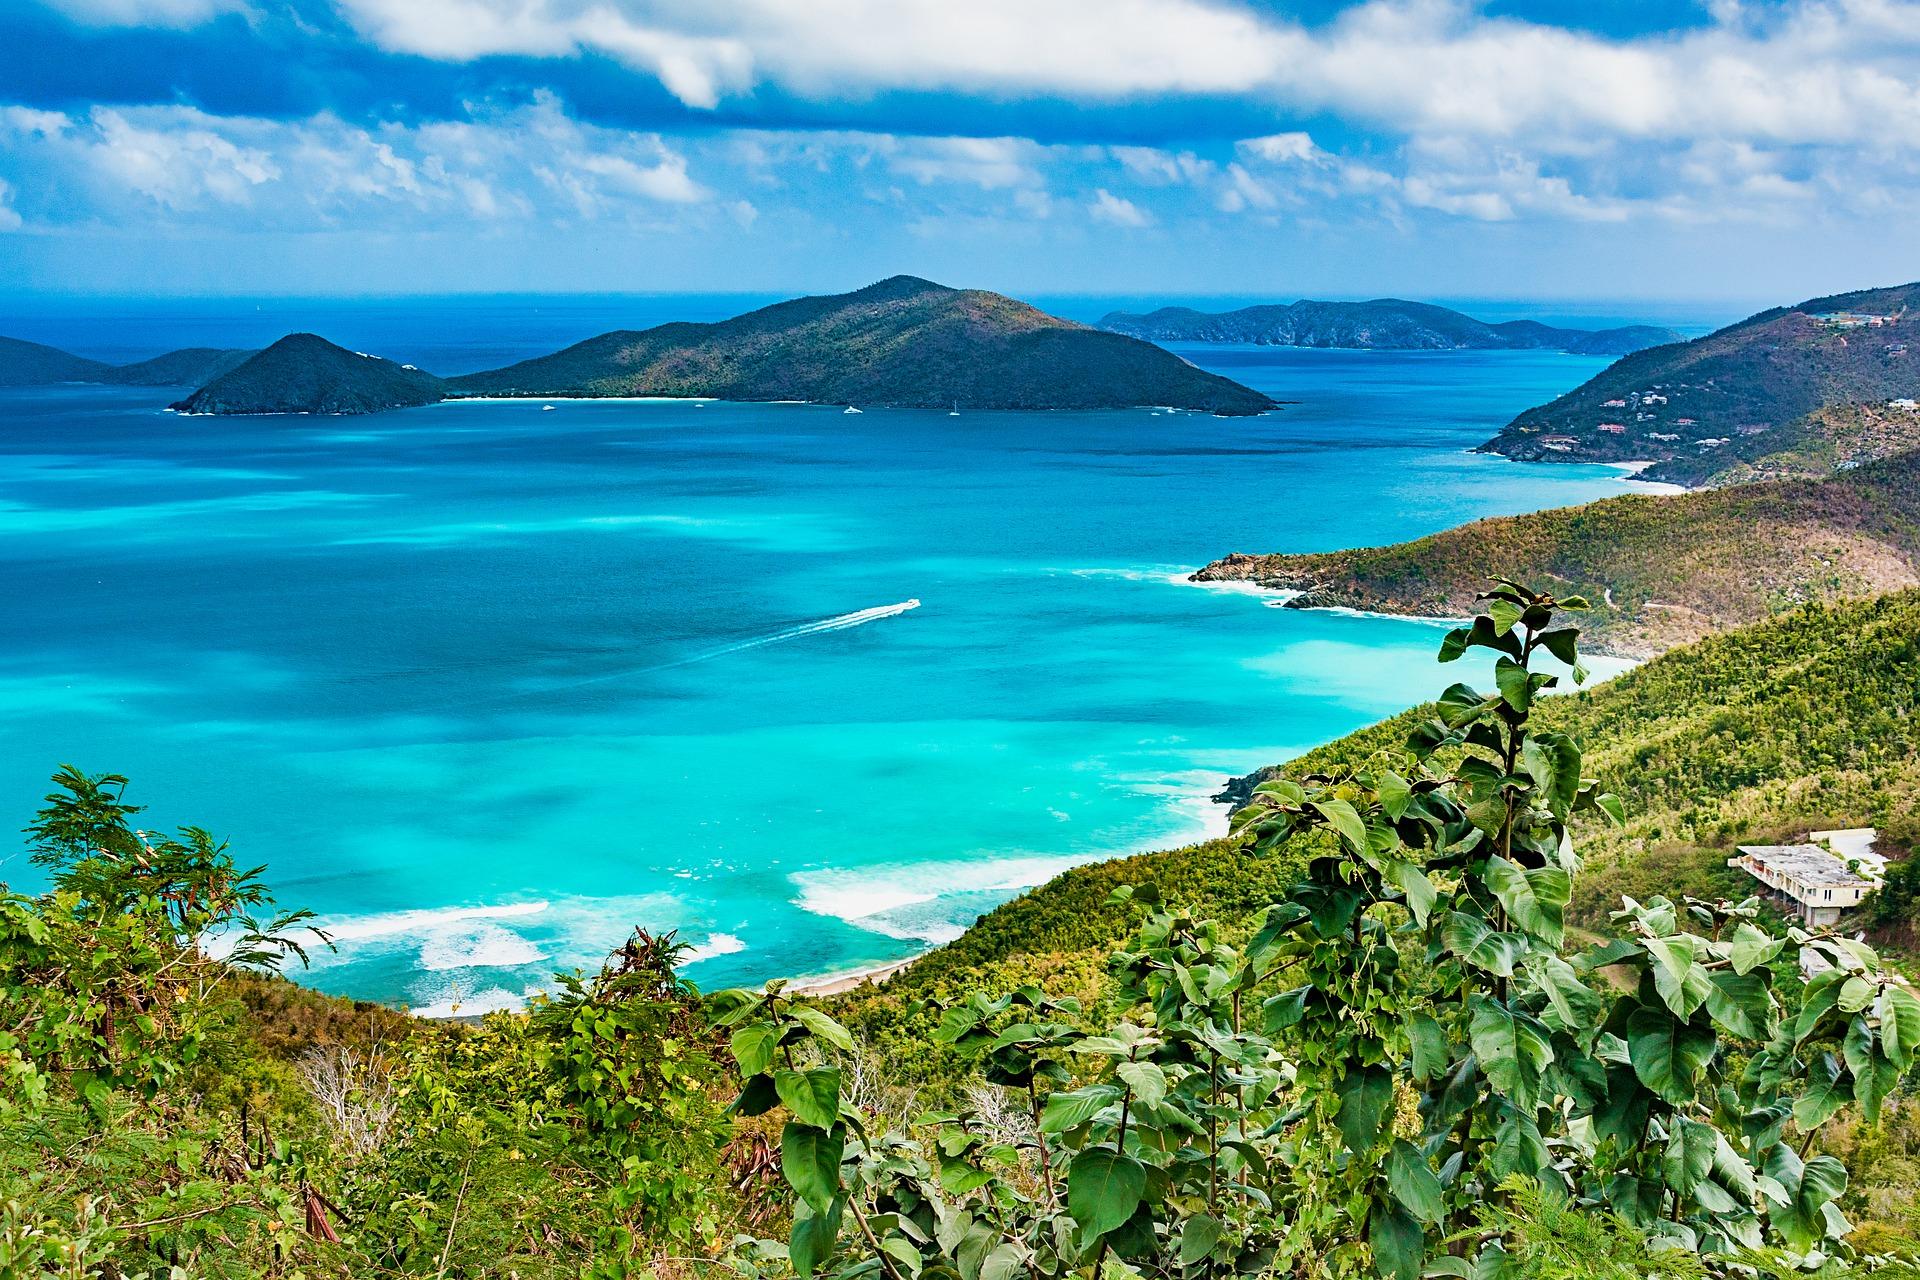 Tortola on the British Virgin Islands in the Caribbean